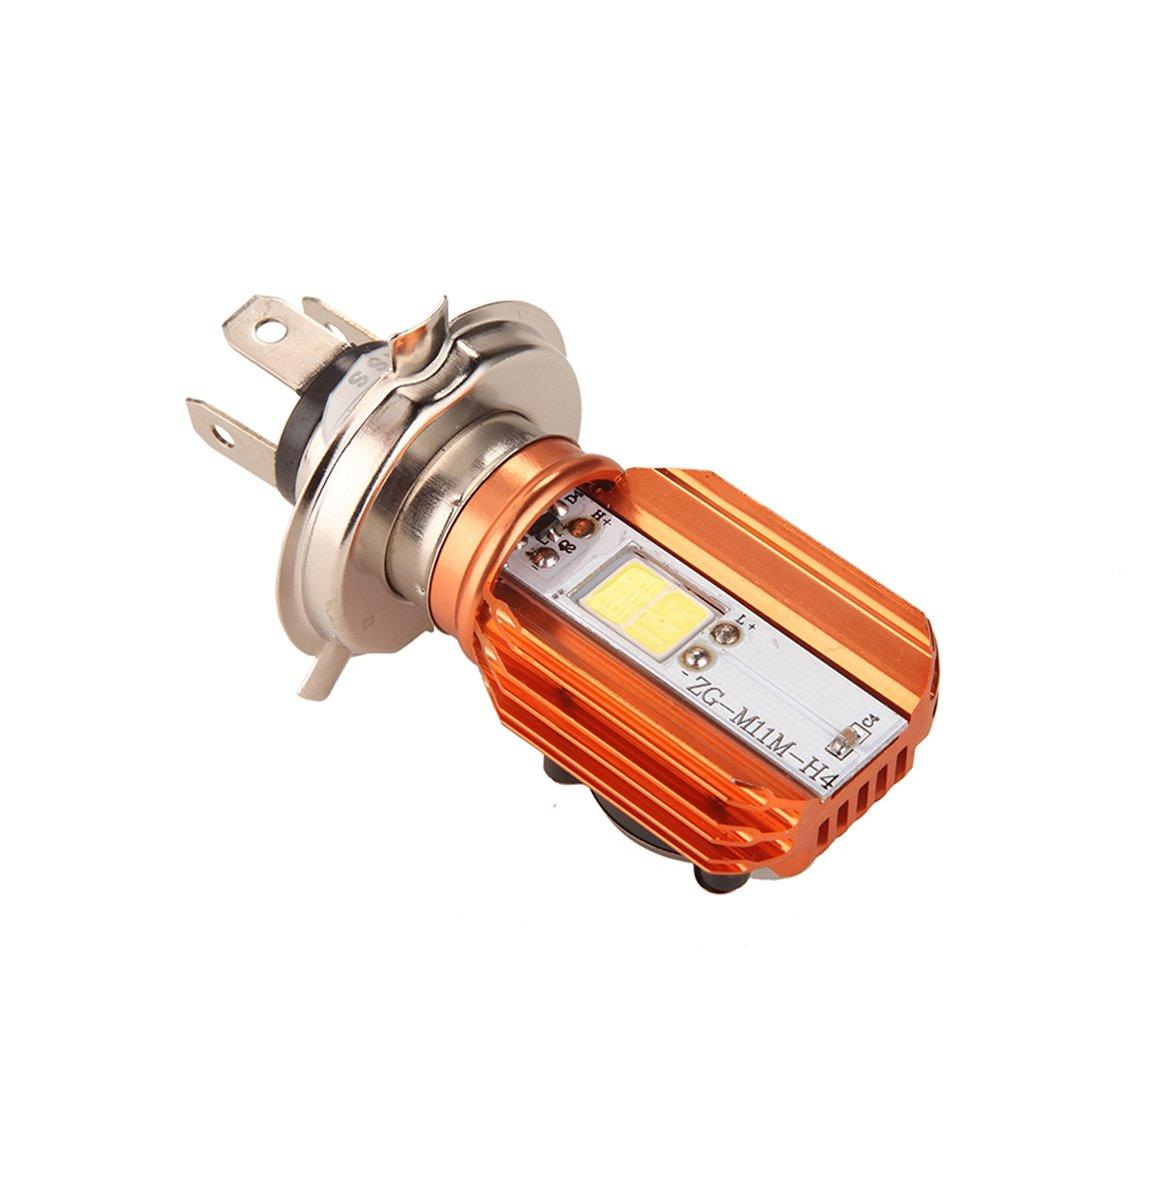 CLighting LED Motorcycle Headlight Bulb H4 Moto Headlamp with Cooling Fan DC9-100V 20W Hi/Lo Beam Lights for BMW Suzuki Yamaha Kawasaki Honda (Pack of 1) 4333003599